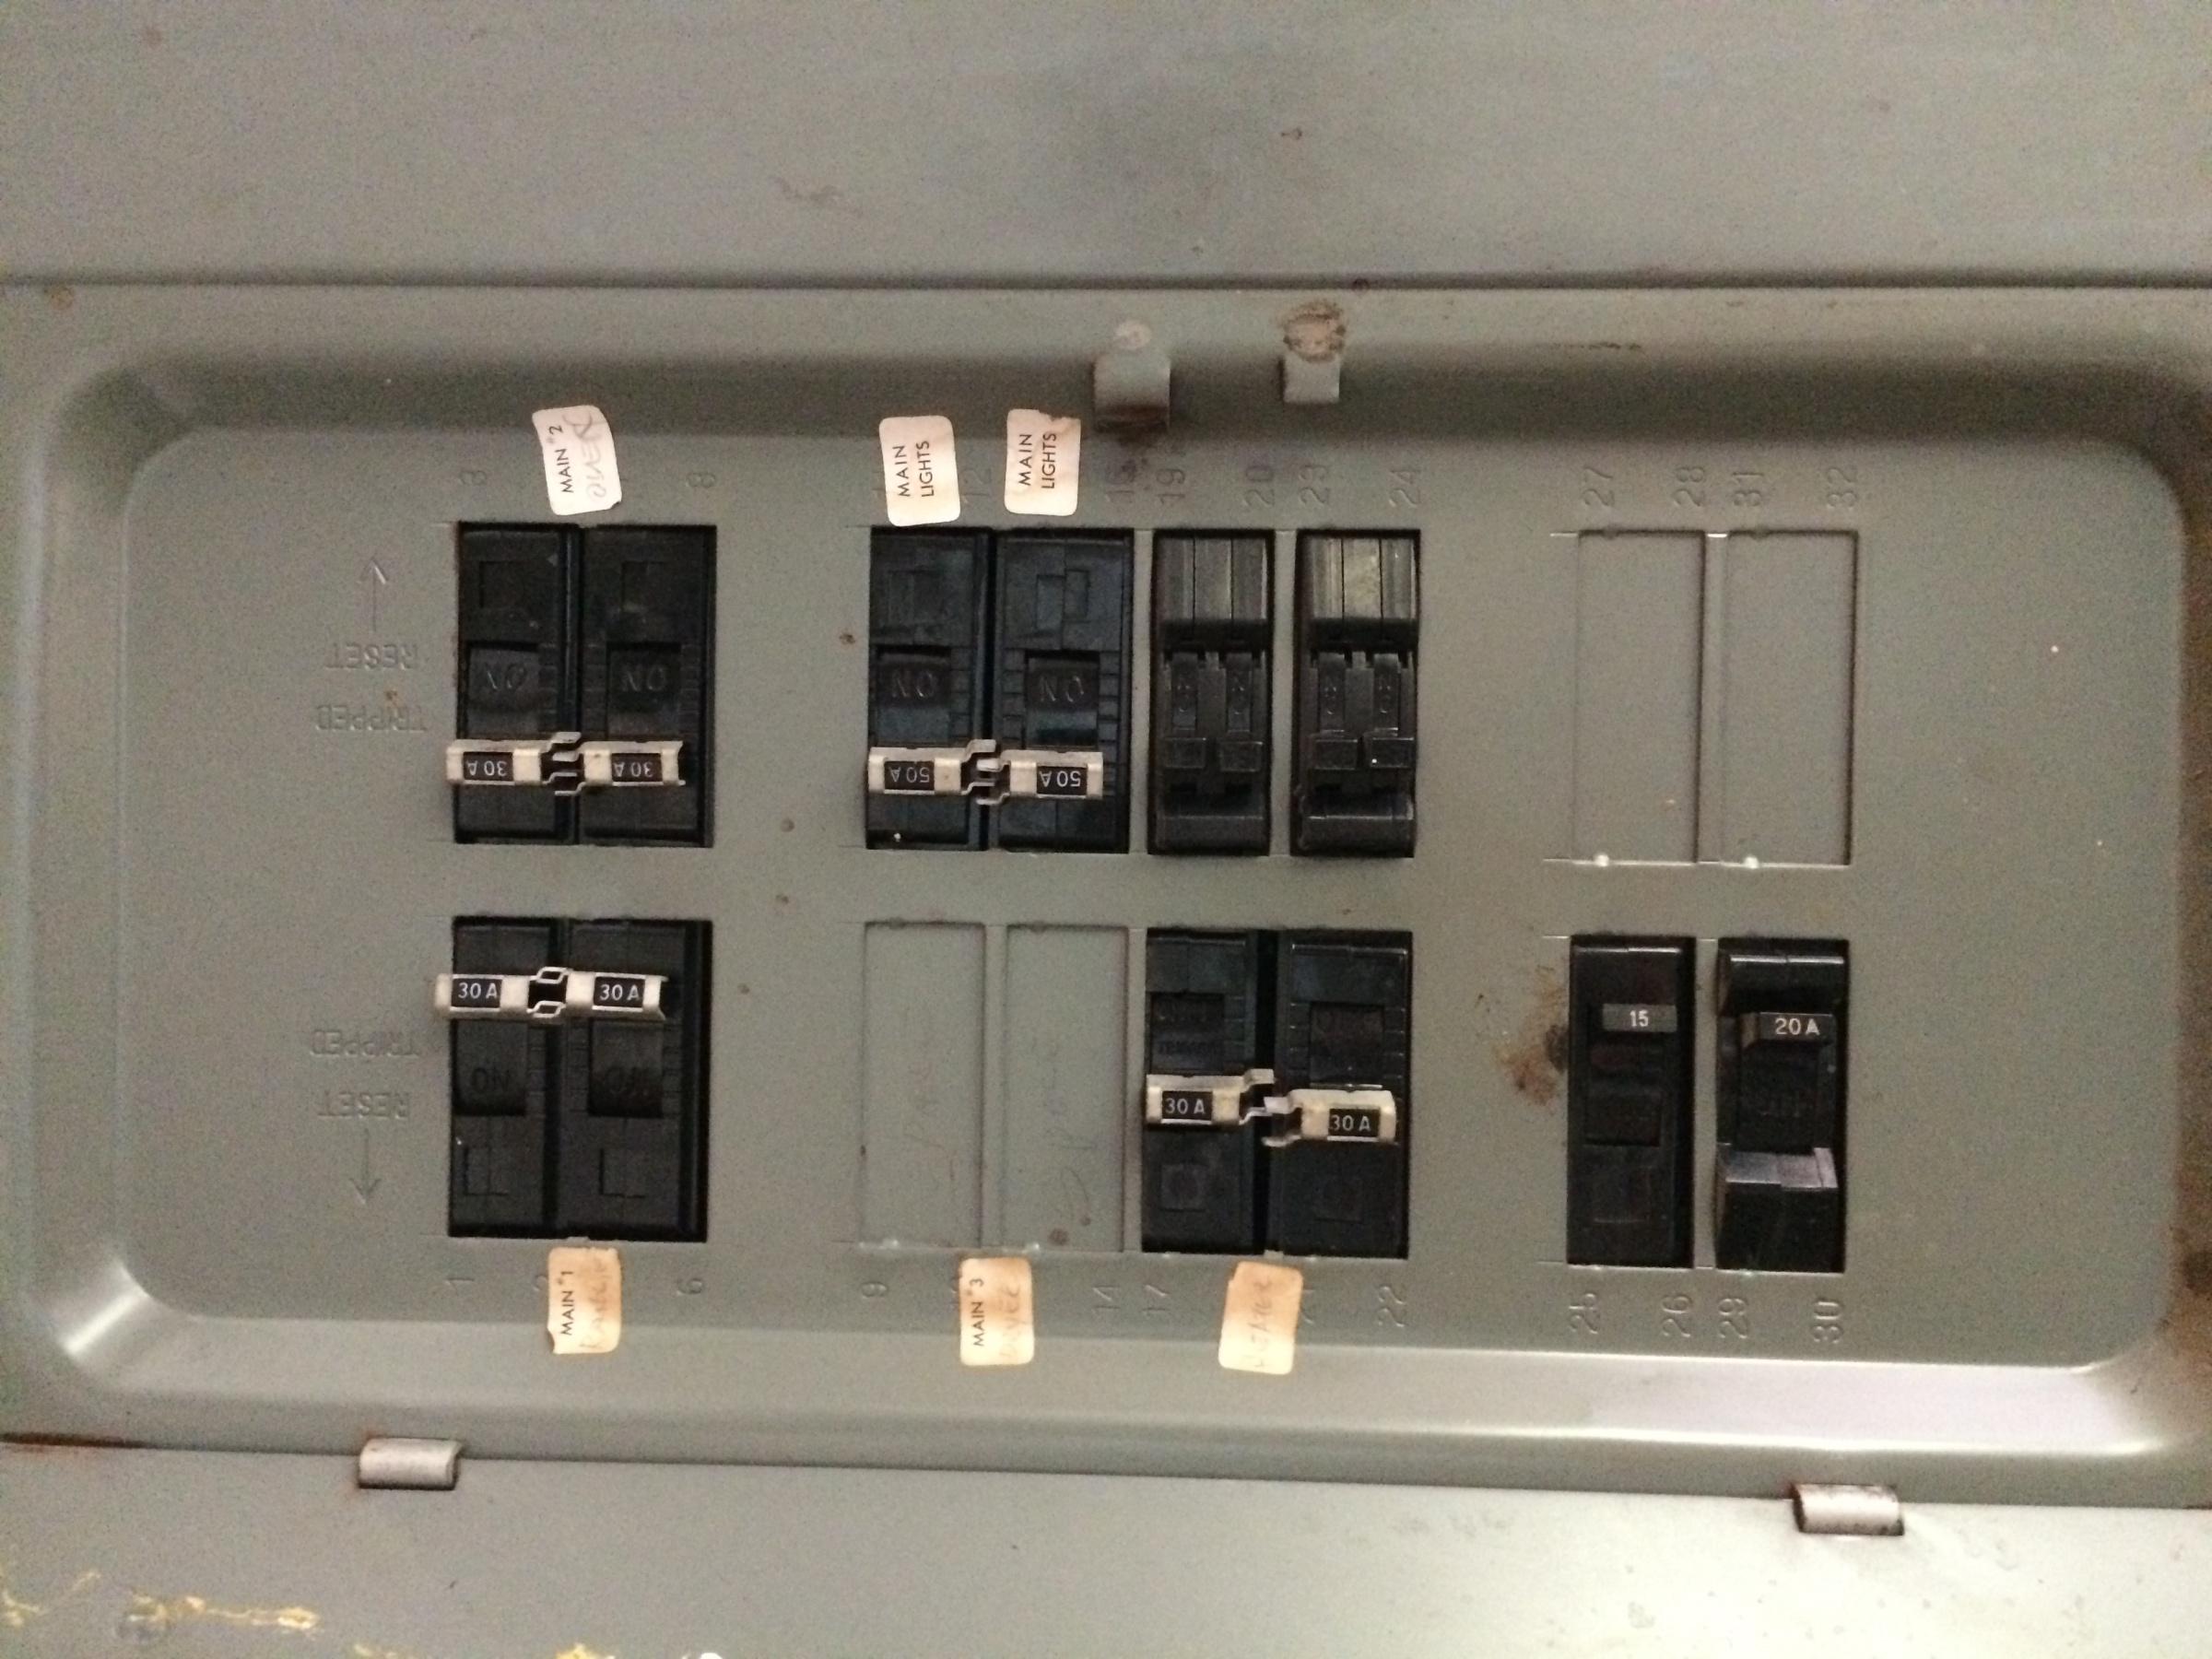 New Appliances  Circuit Breaker Panel - Electrical